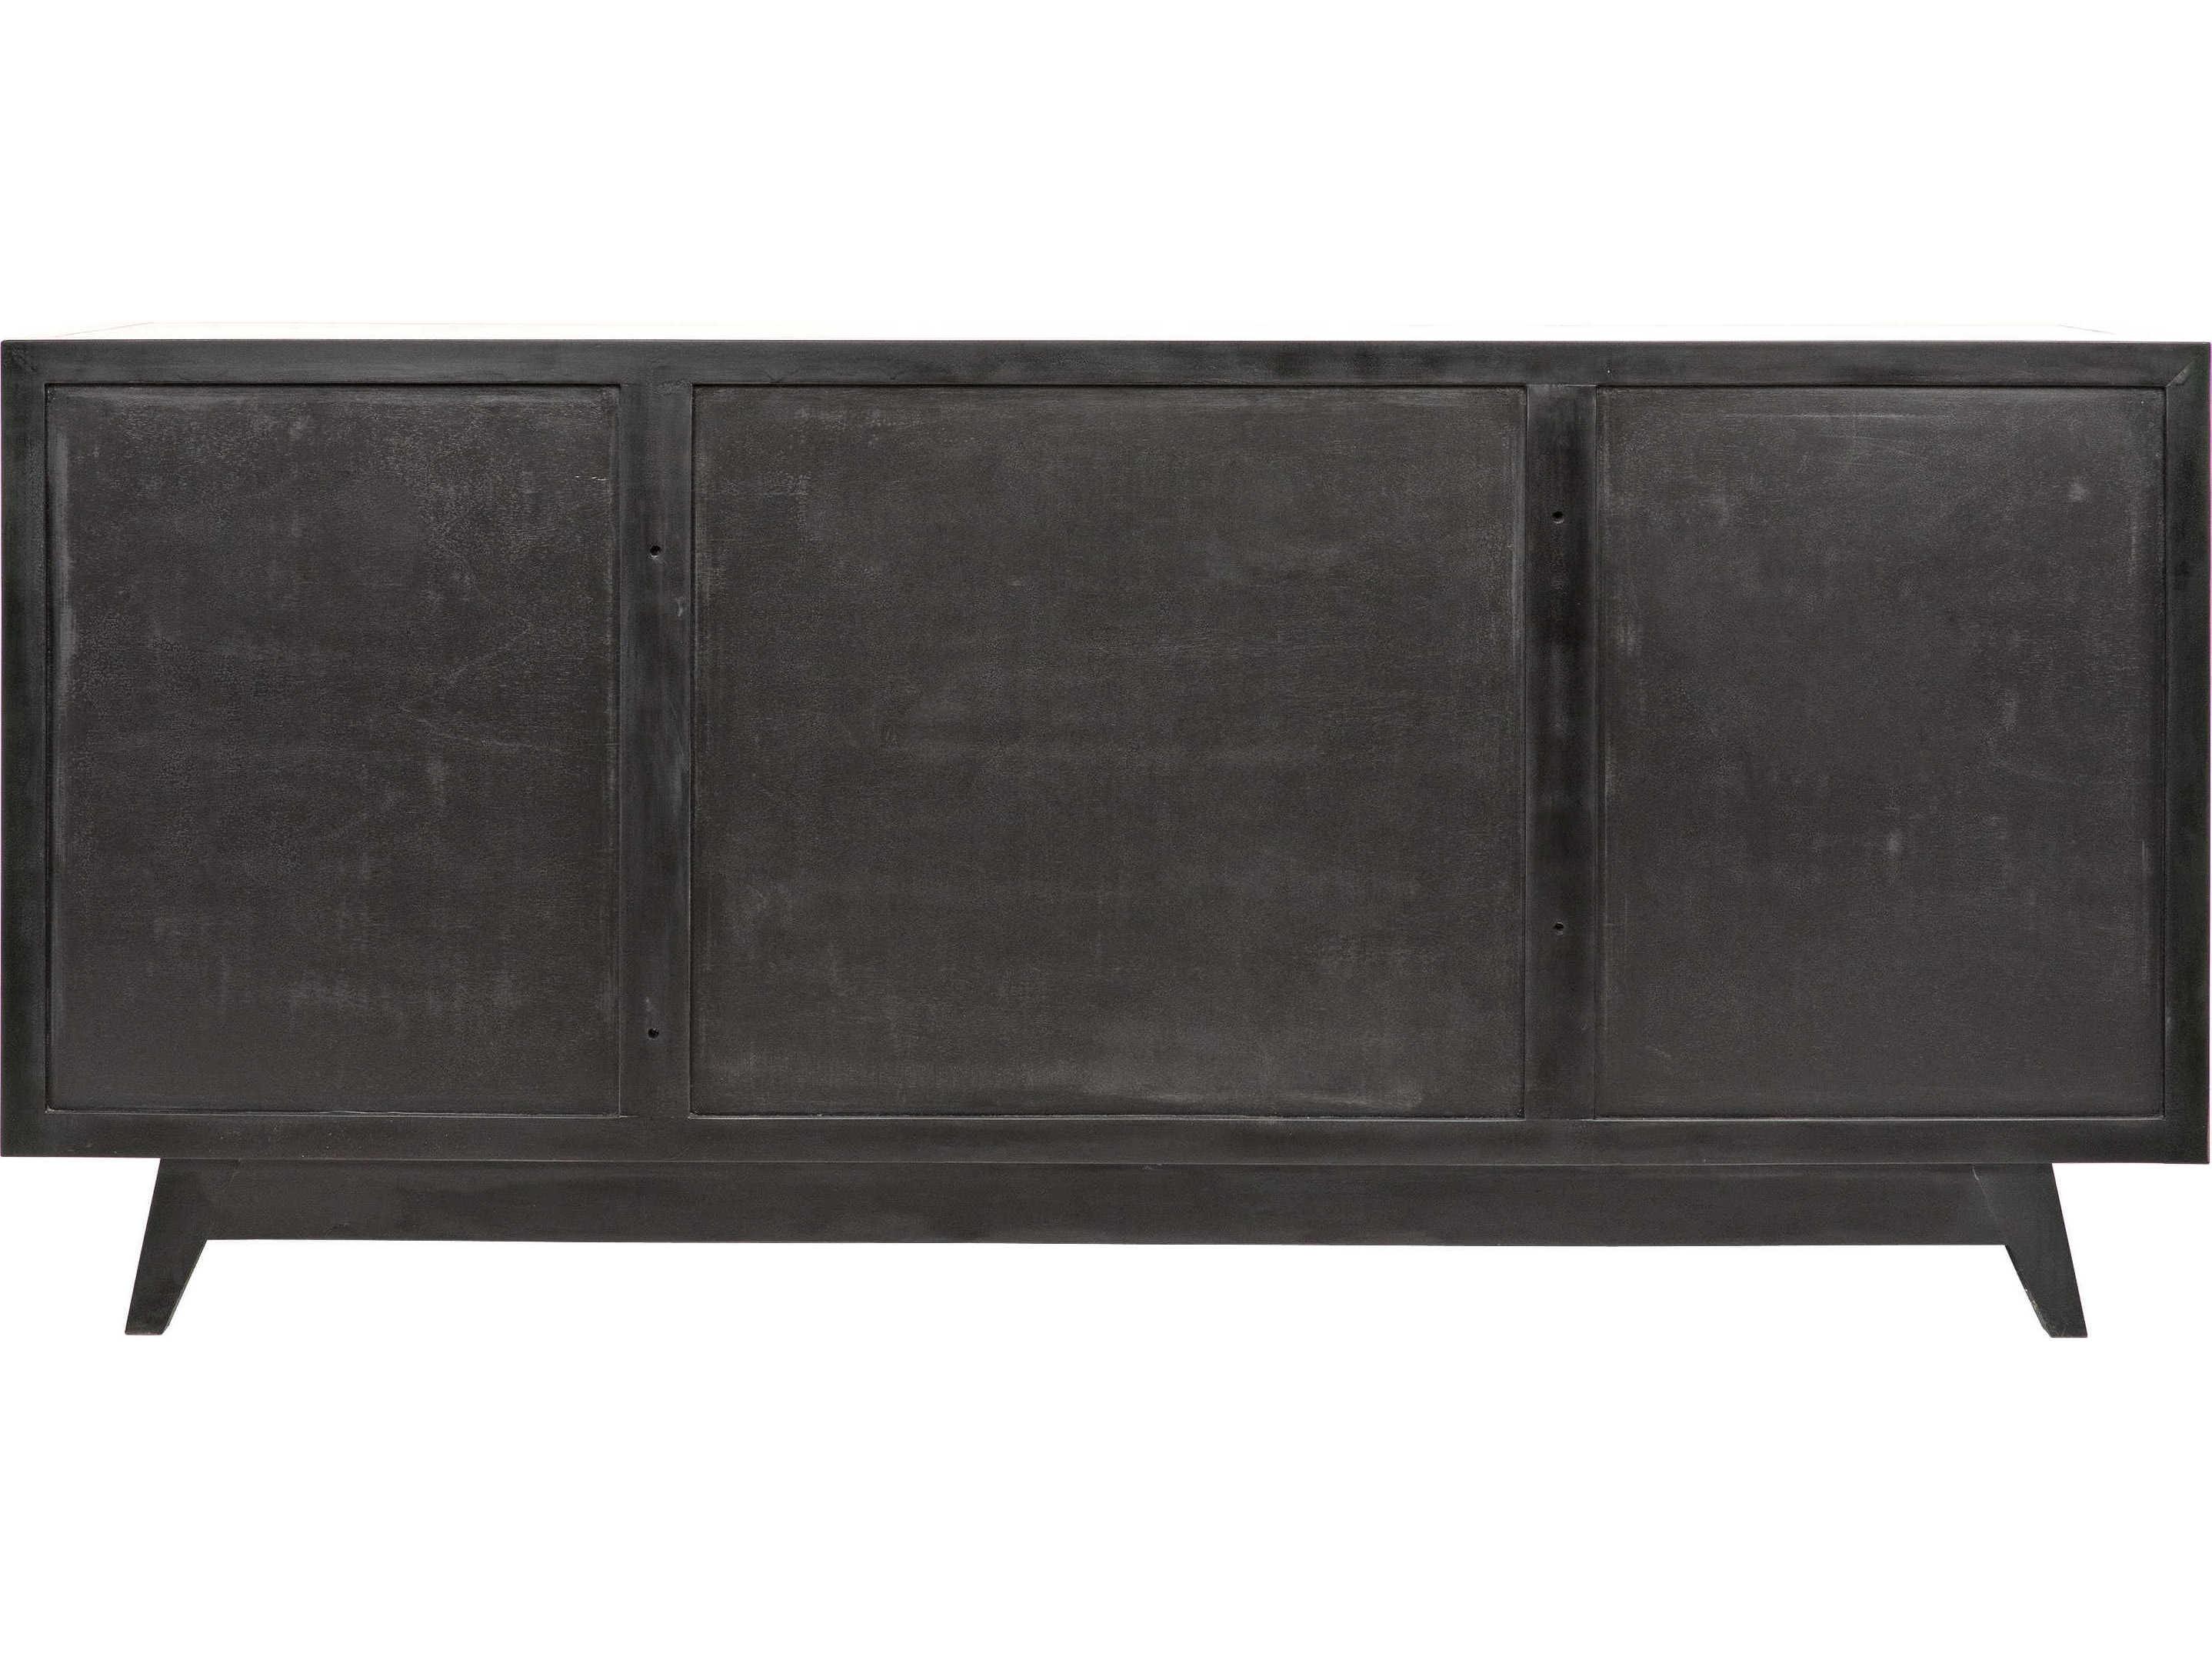 Noir Furniture Wyatt Charcoal 73'' X 23'' Sideboard | Noigcon249Ch regarding Wyatt Sideboards (Image 12 of 30)